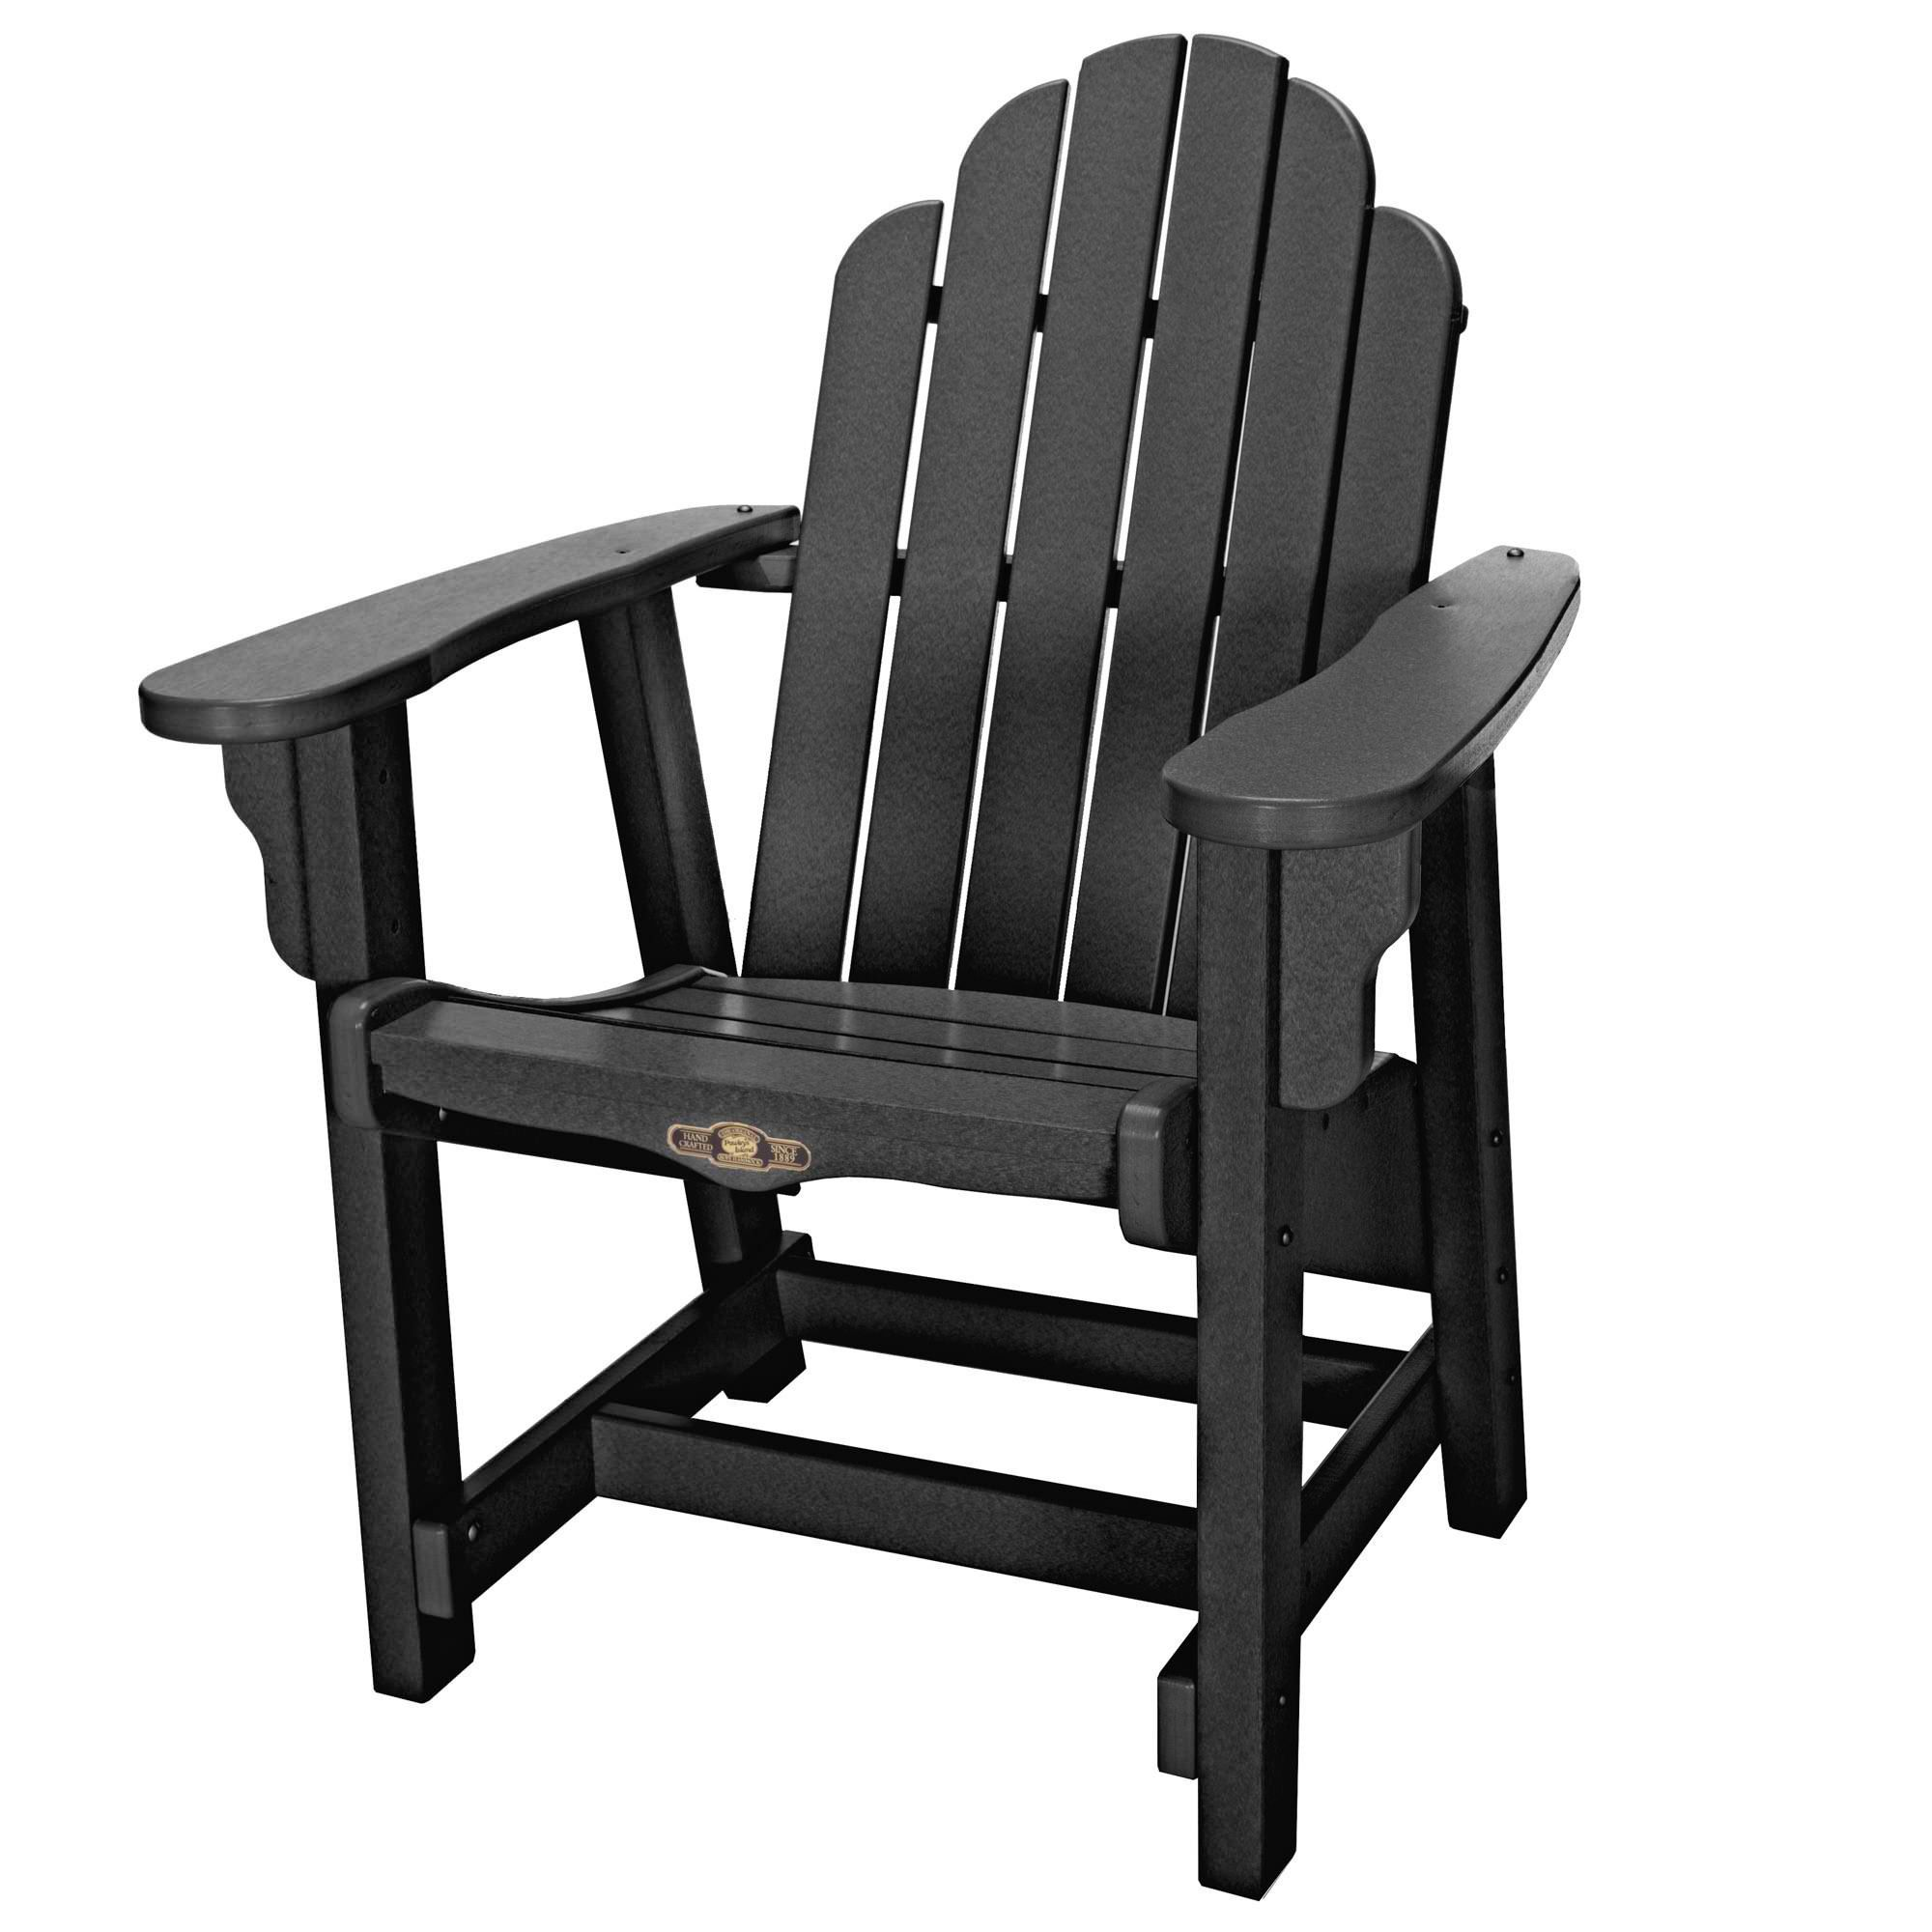 Pawleys Island Essentials Conversational Chair